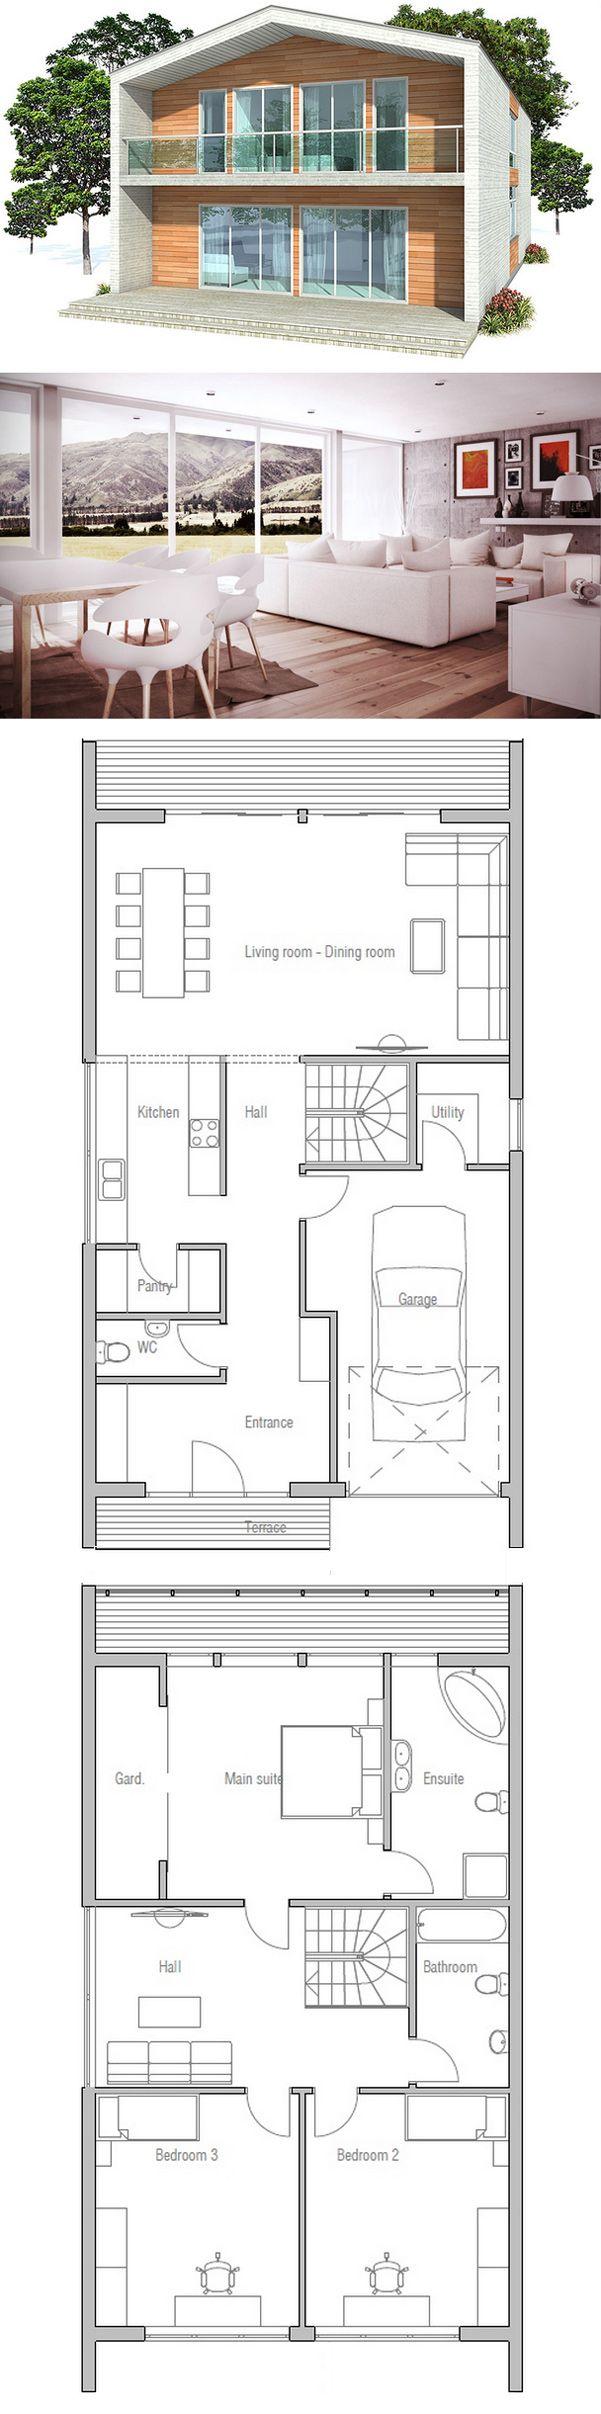 69 best narrow house plans images on pinterest narrow house